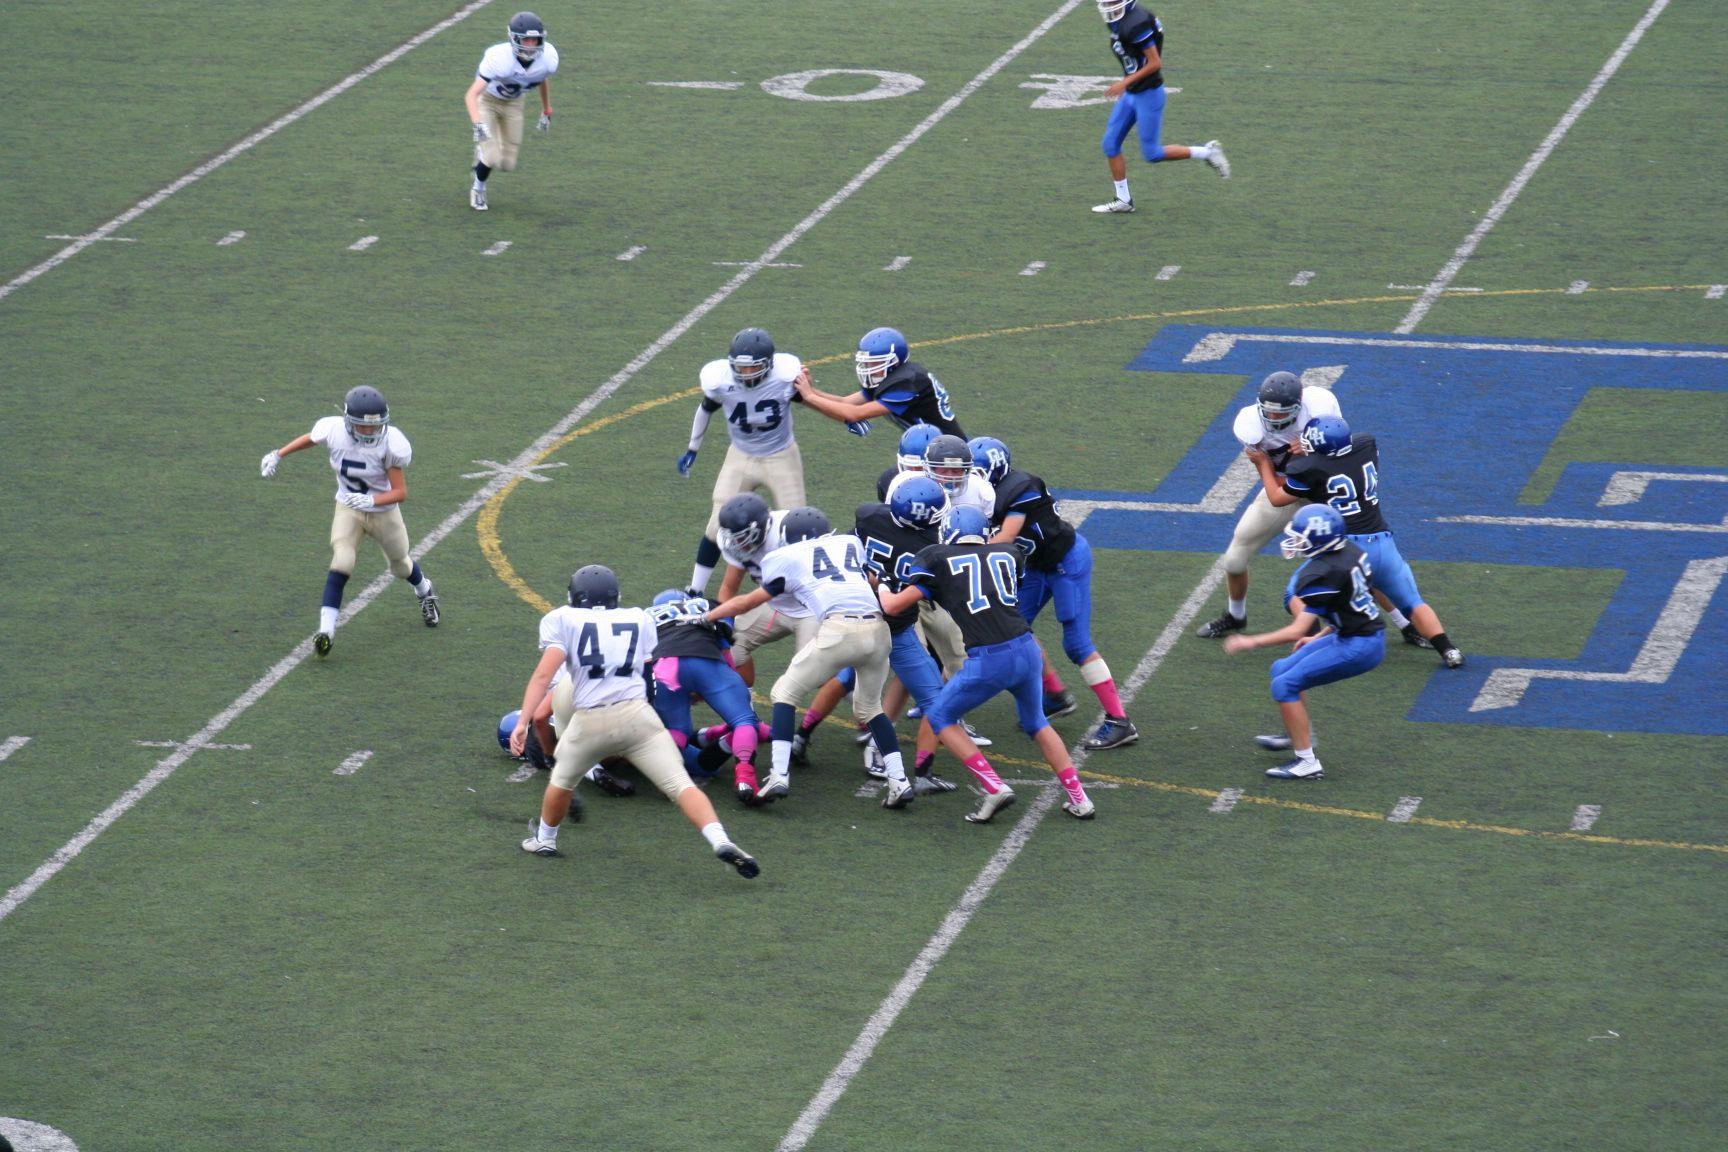 Dana Hills High School Football High School Football High School Football